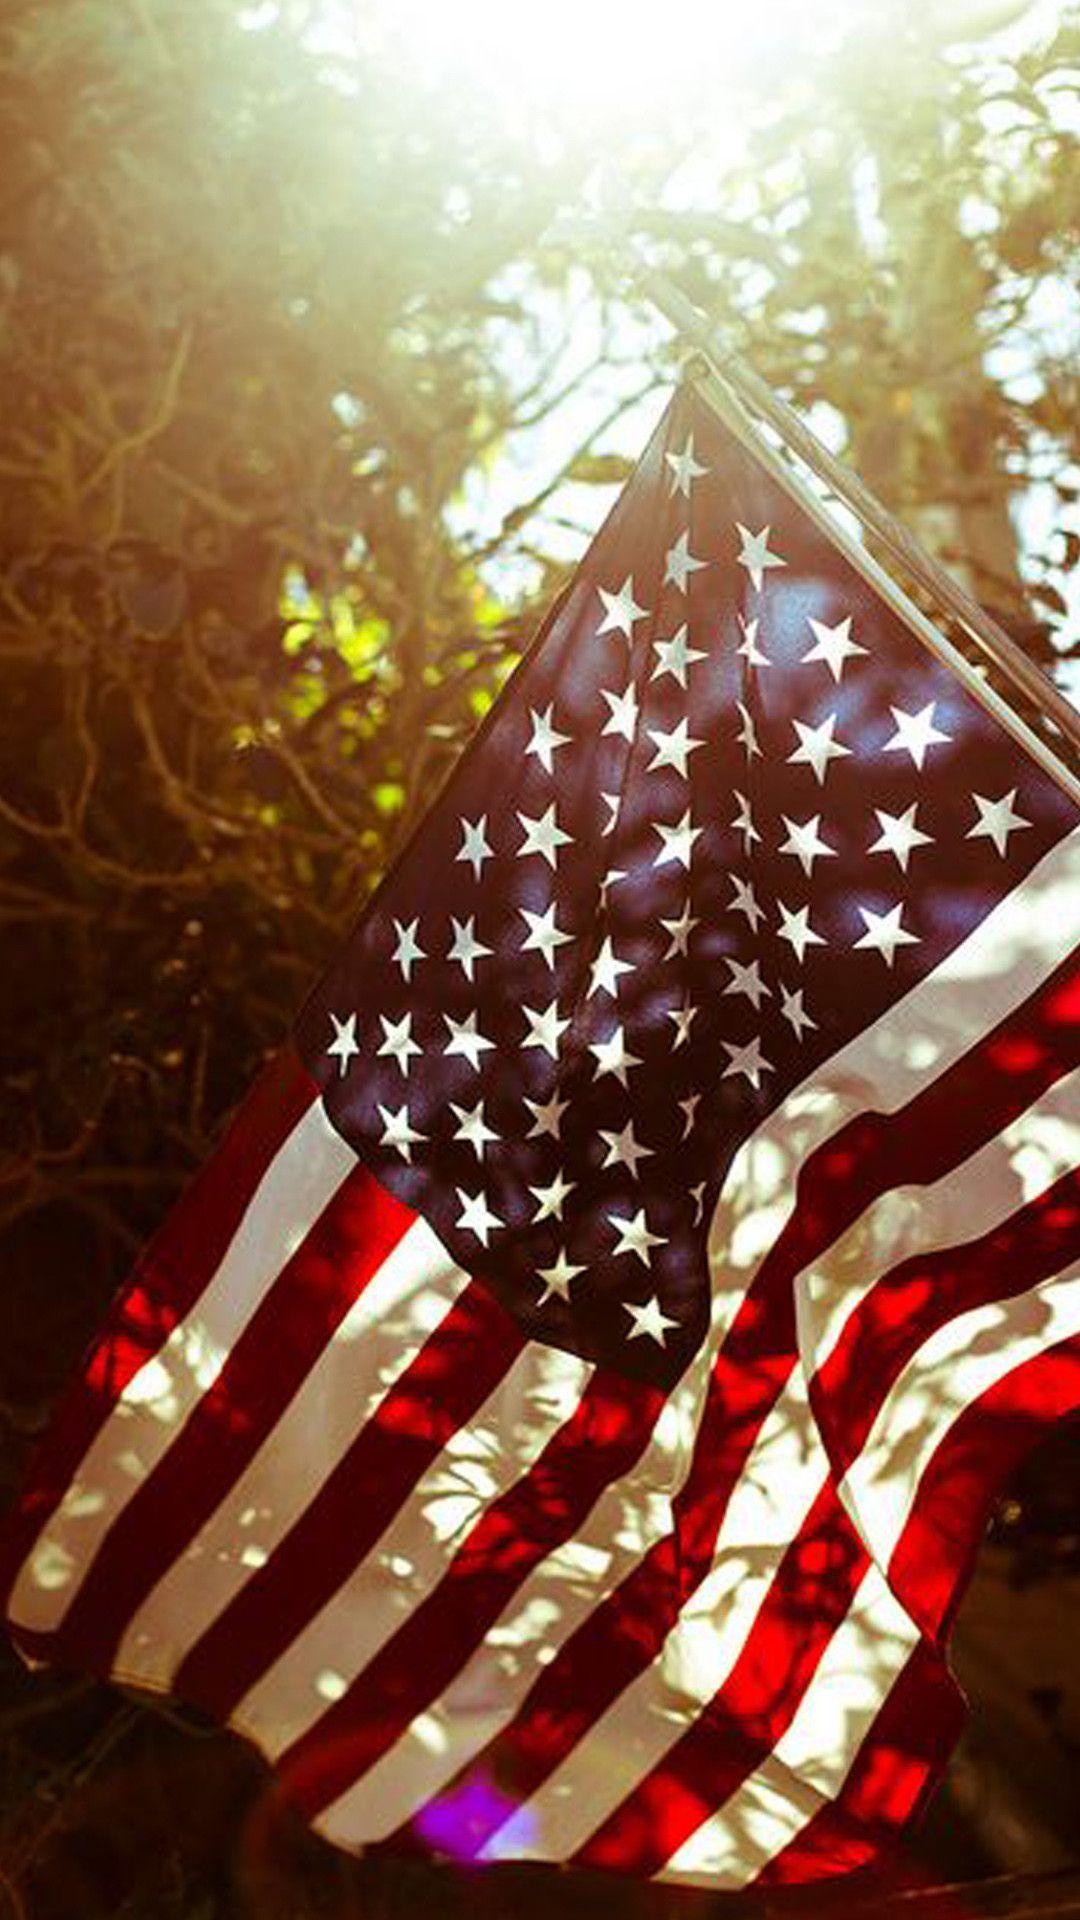 Vintage American Flag Wallpaper Android Download Vintage